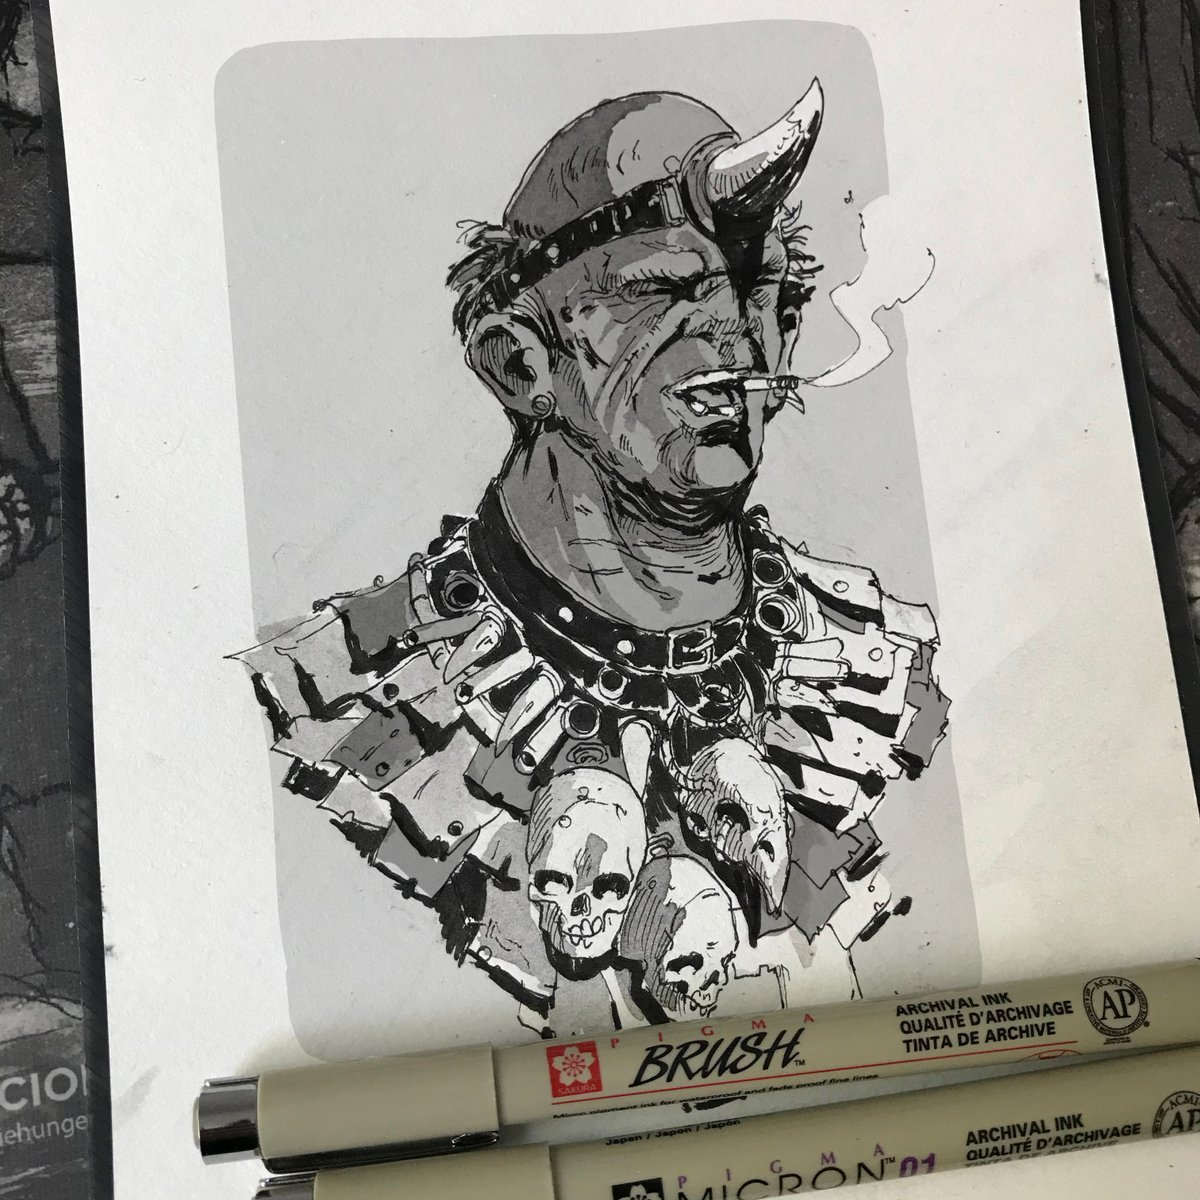 "21. Earth Ad  ""Oh, doom on earth as it is in hell We'll see you dead and like it""  #Misfits #ink #sketch #art #illustration #inktober2020 #inktober #skulls #Doom #scifi #conceptart https://t.co/D6lWykxMg0"